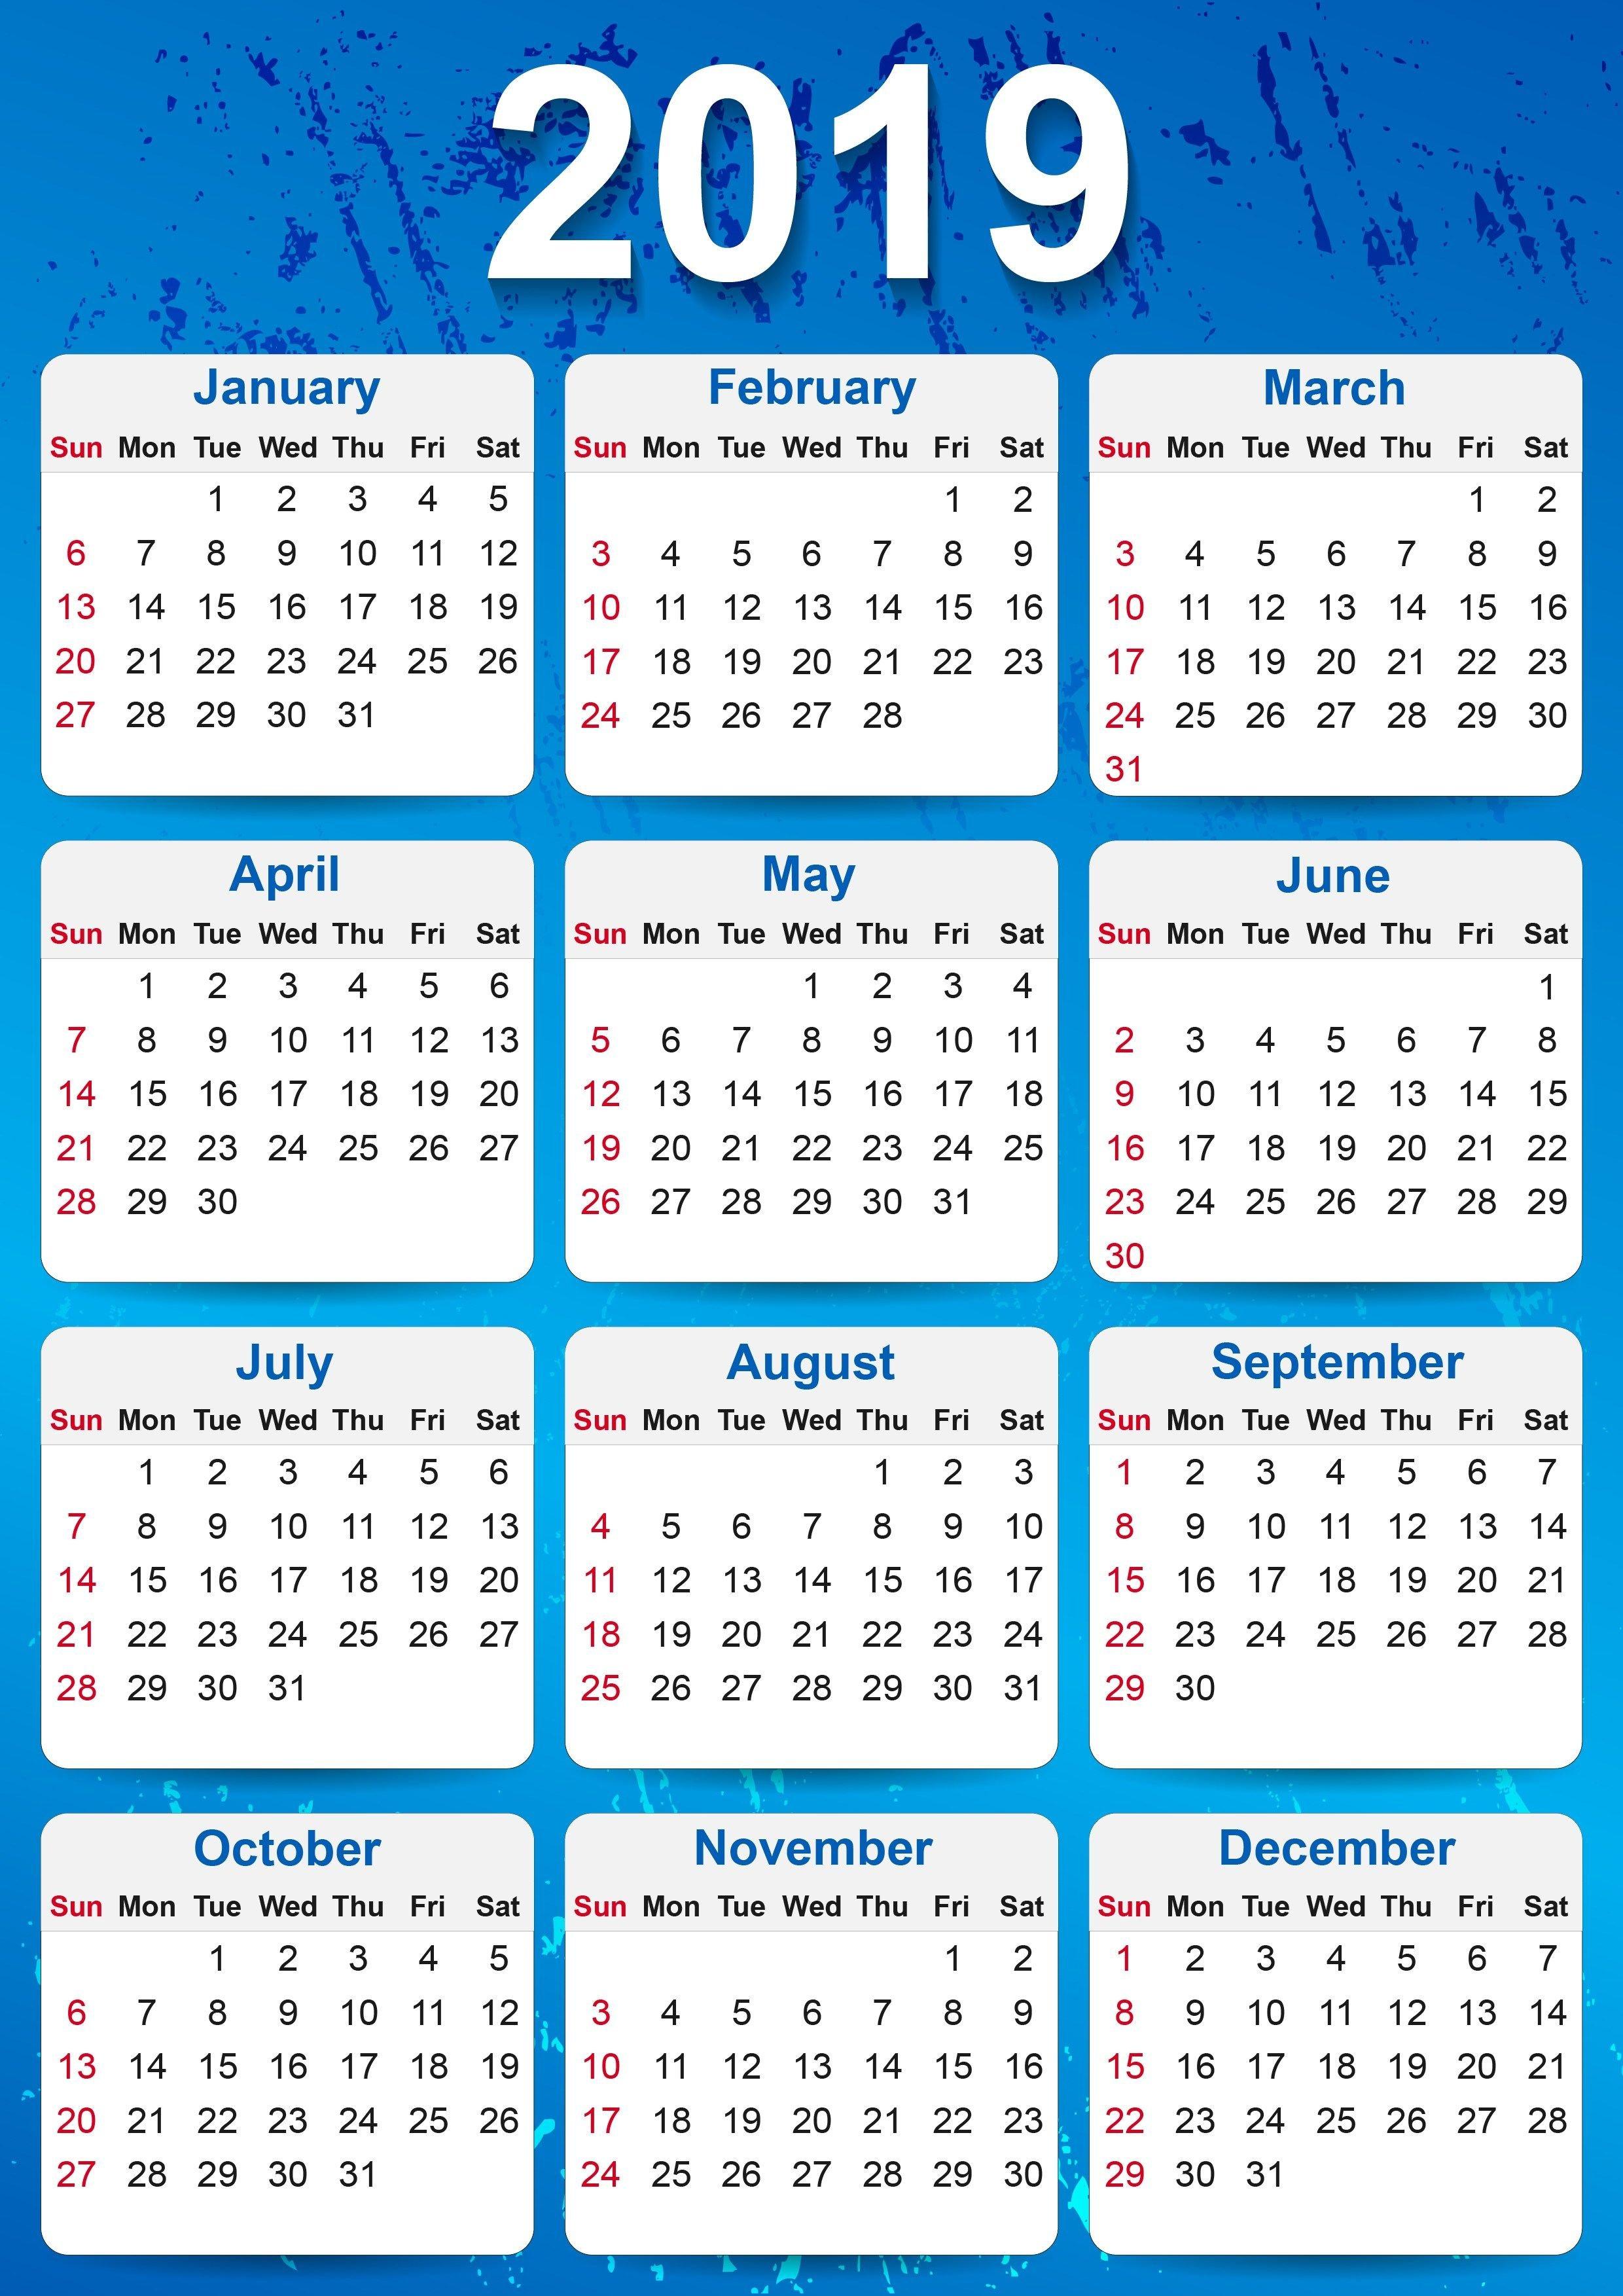 2019 Yearly Calendar Printable | Calendar | 2019 Yearly Calendar Calendar 2019 Pdf Free Download